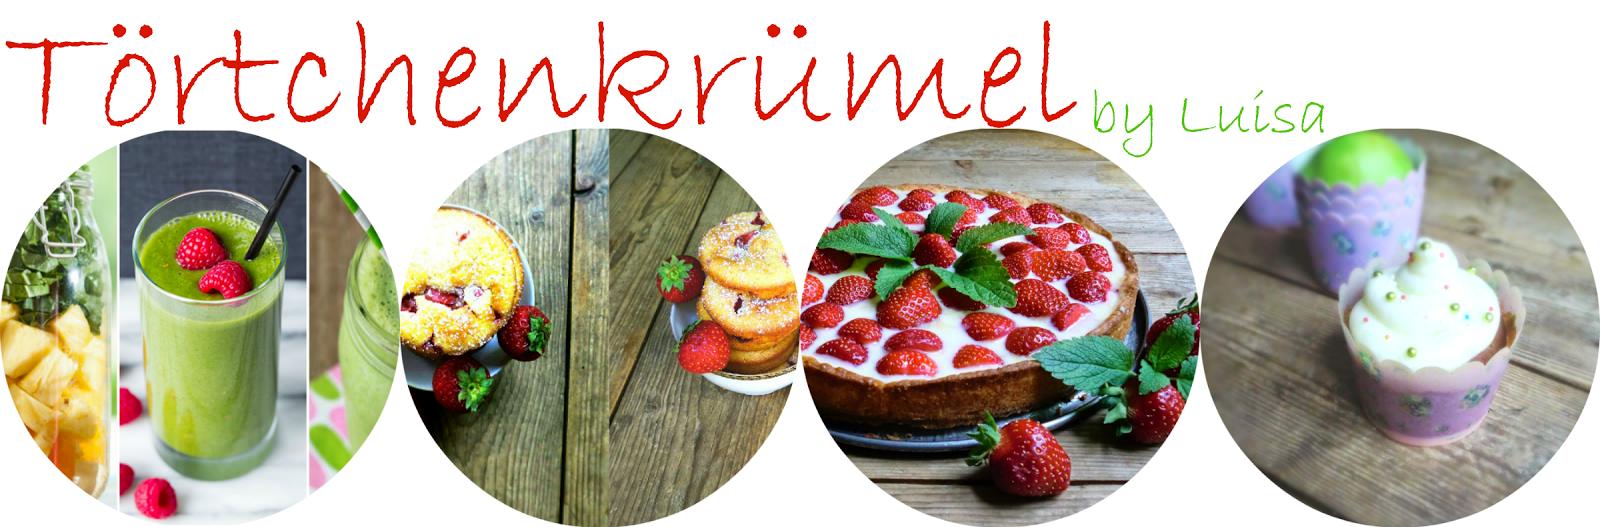 http://toertchenkruemel.blogspot.de/